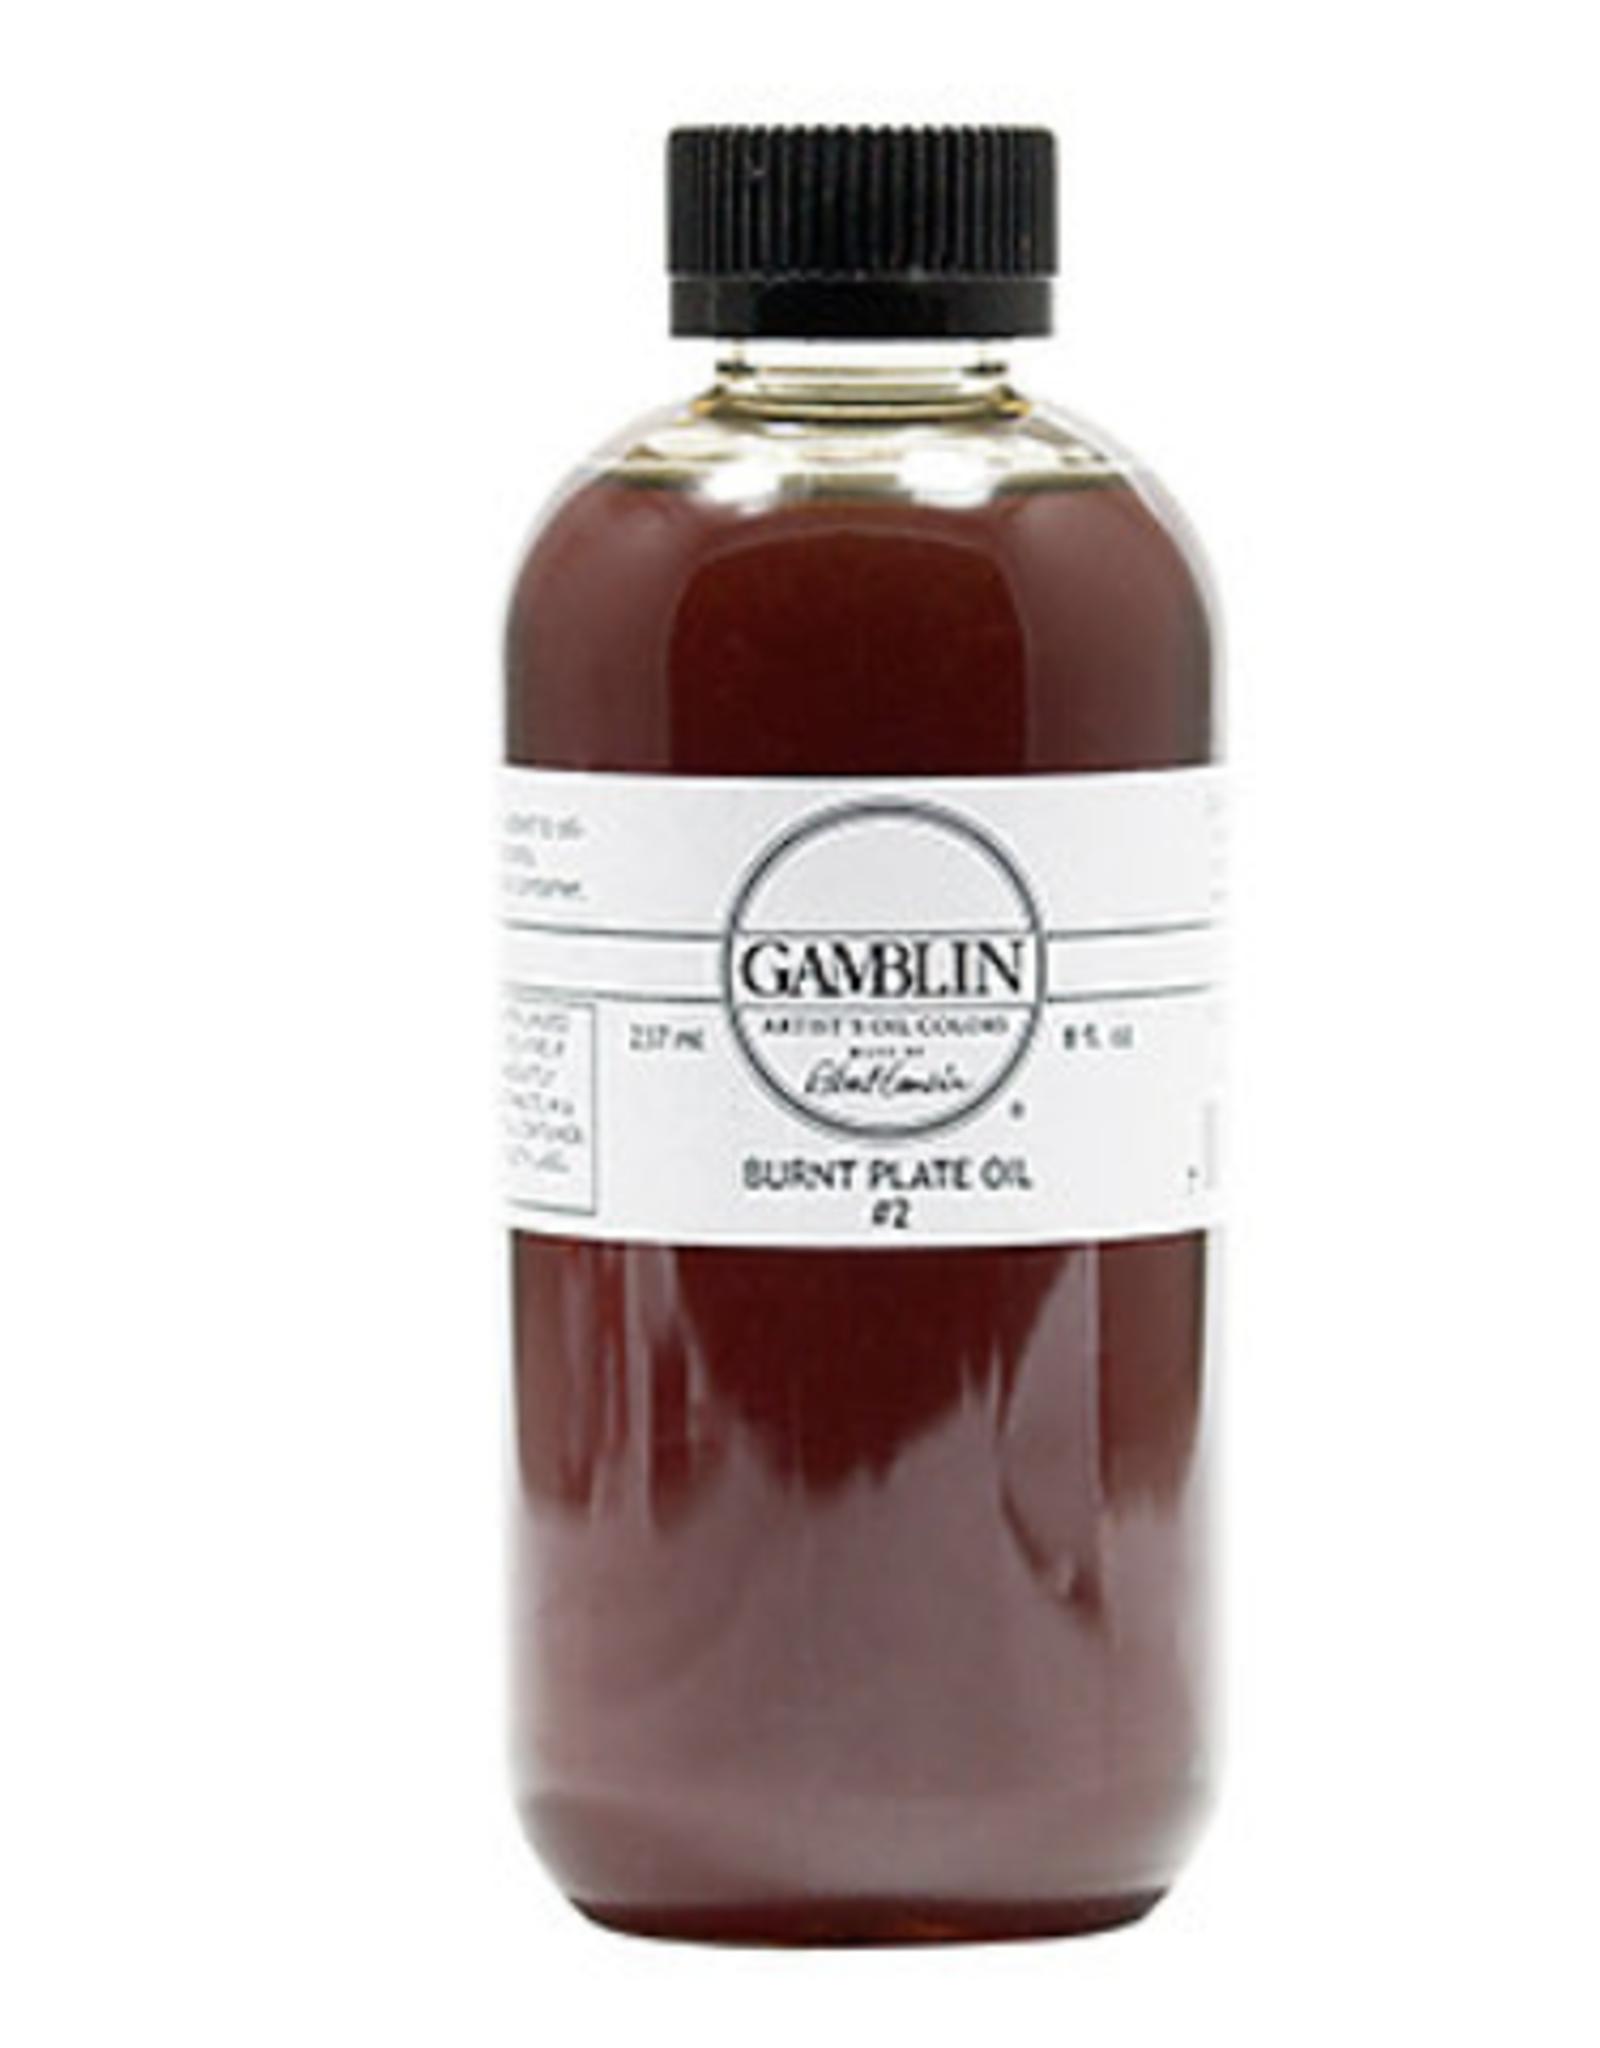 Gamblin, Burnt Plate Oil #2 8.5oz